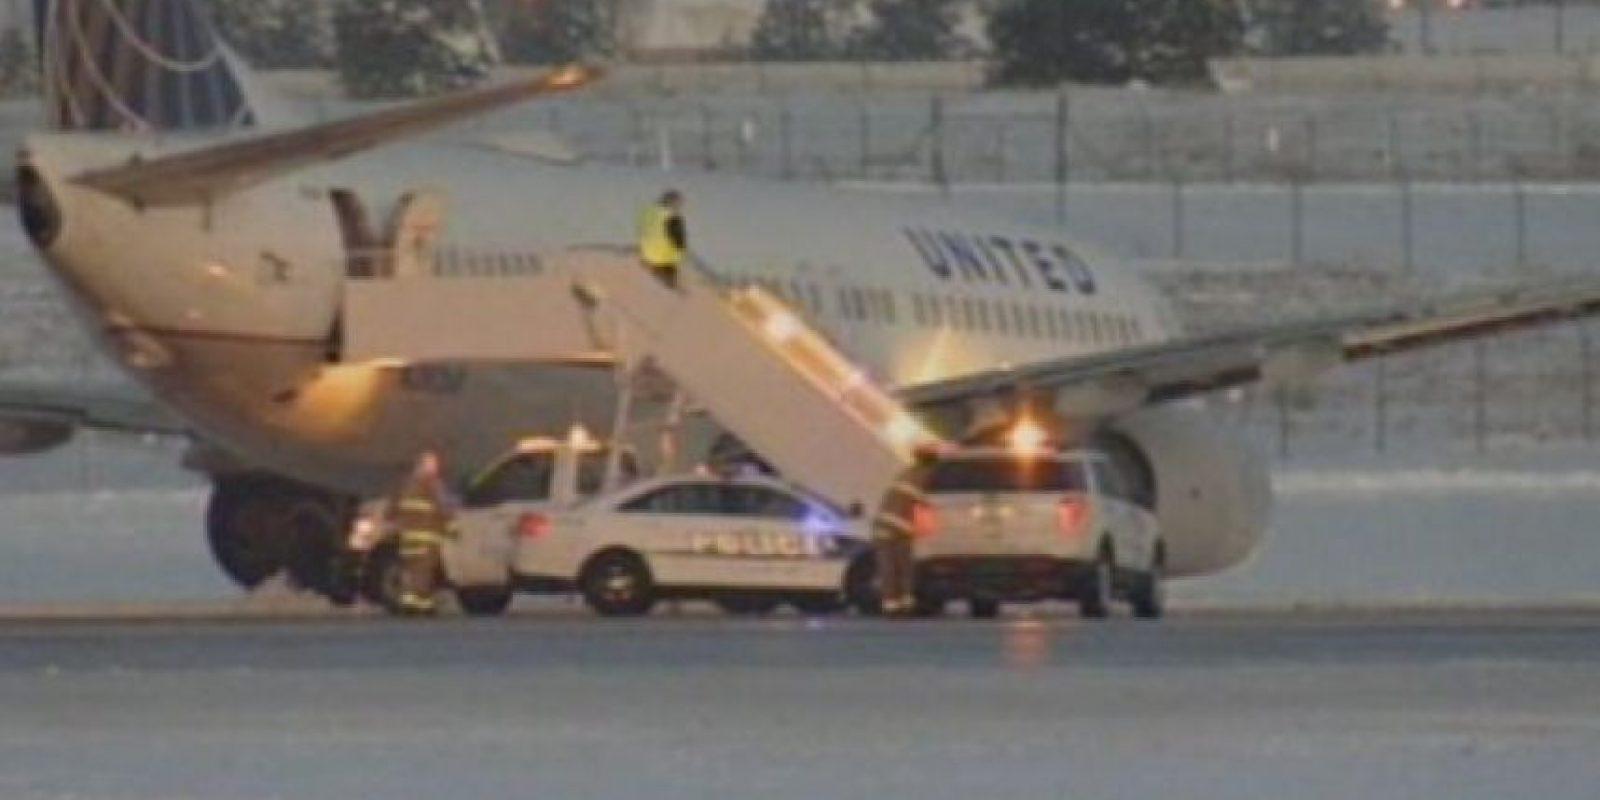 Llega equipo de emergencia para sacar a los pasajeros Foto:@NBCNews